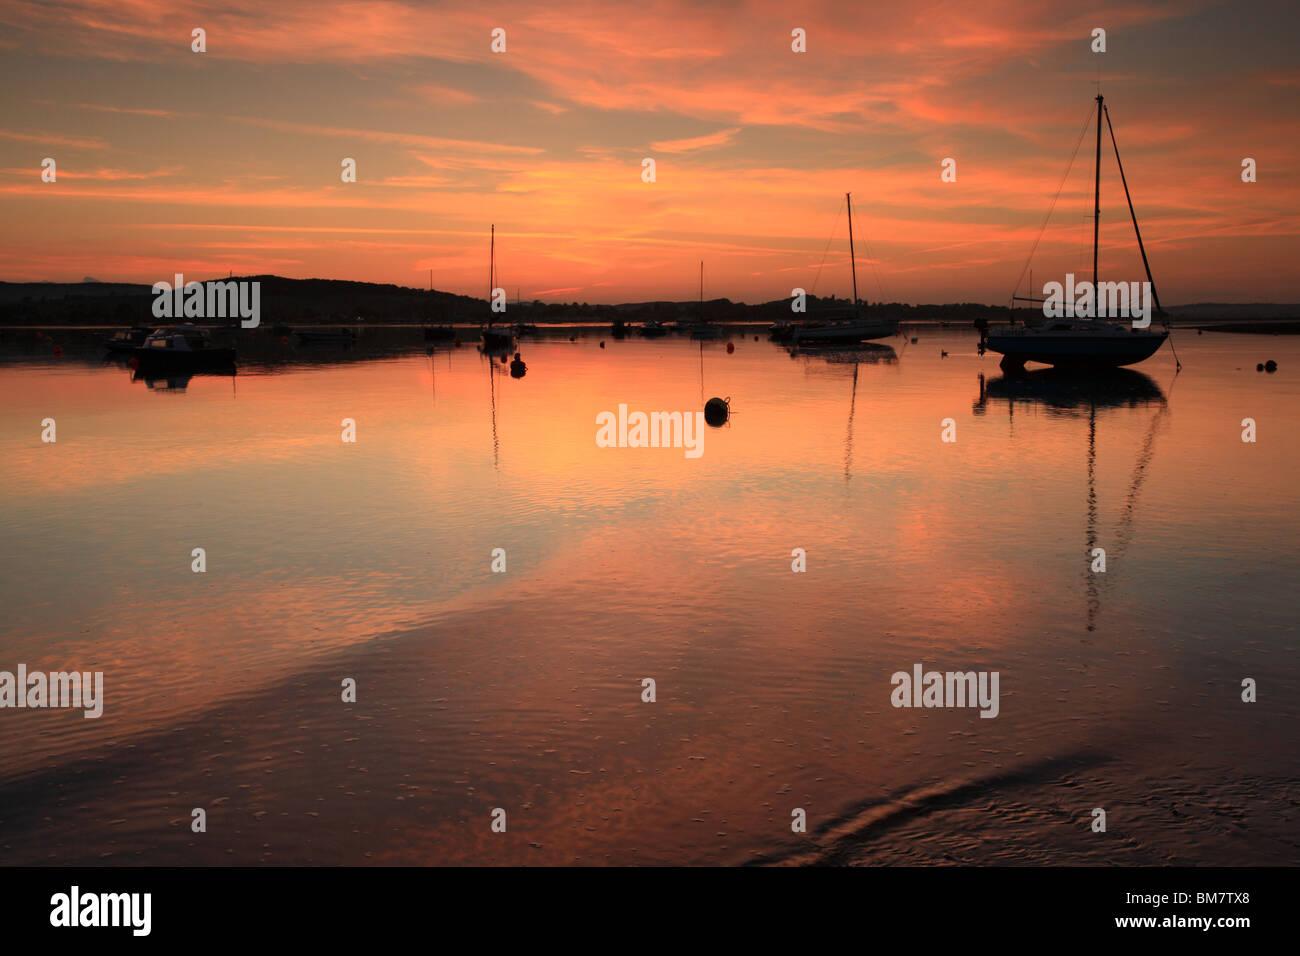 Dusk on River Exe Estuary, view towards Starcross, Devon, England, UK - Stock Image